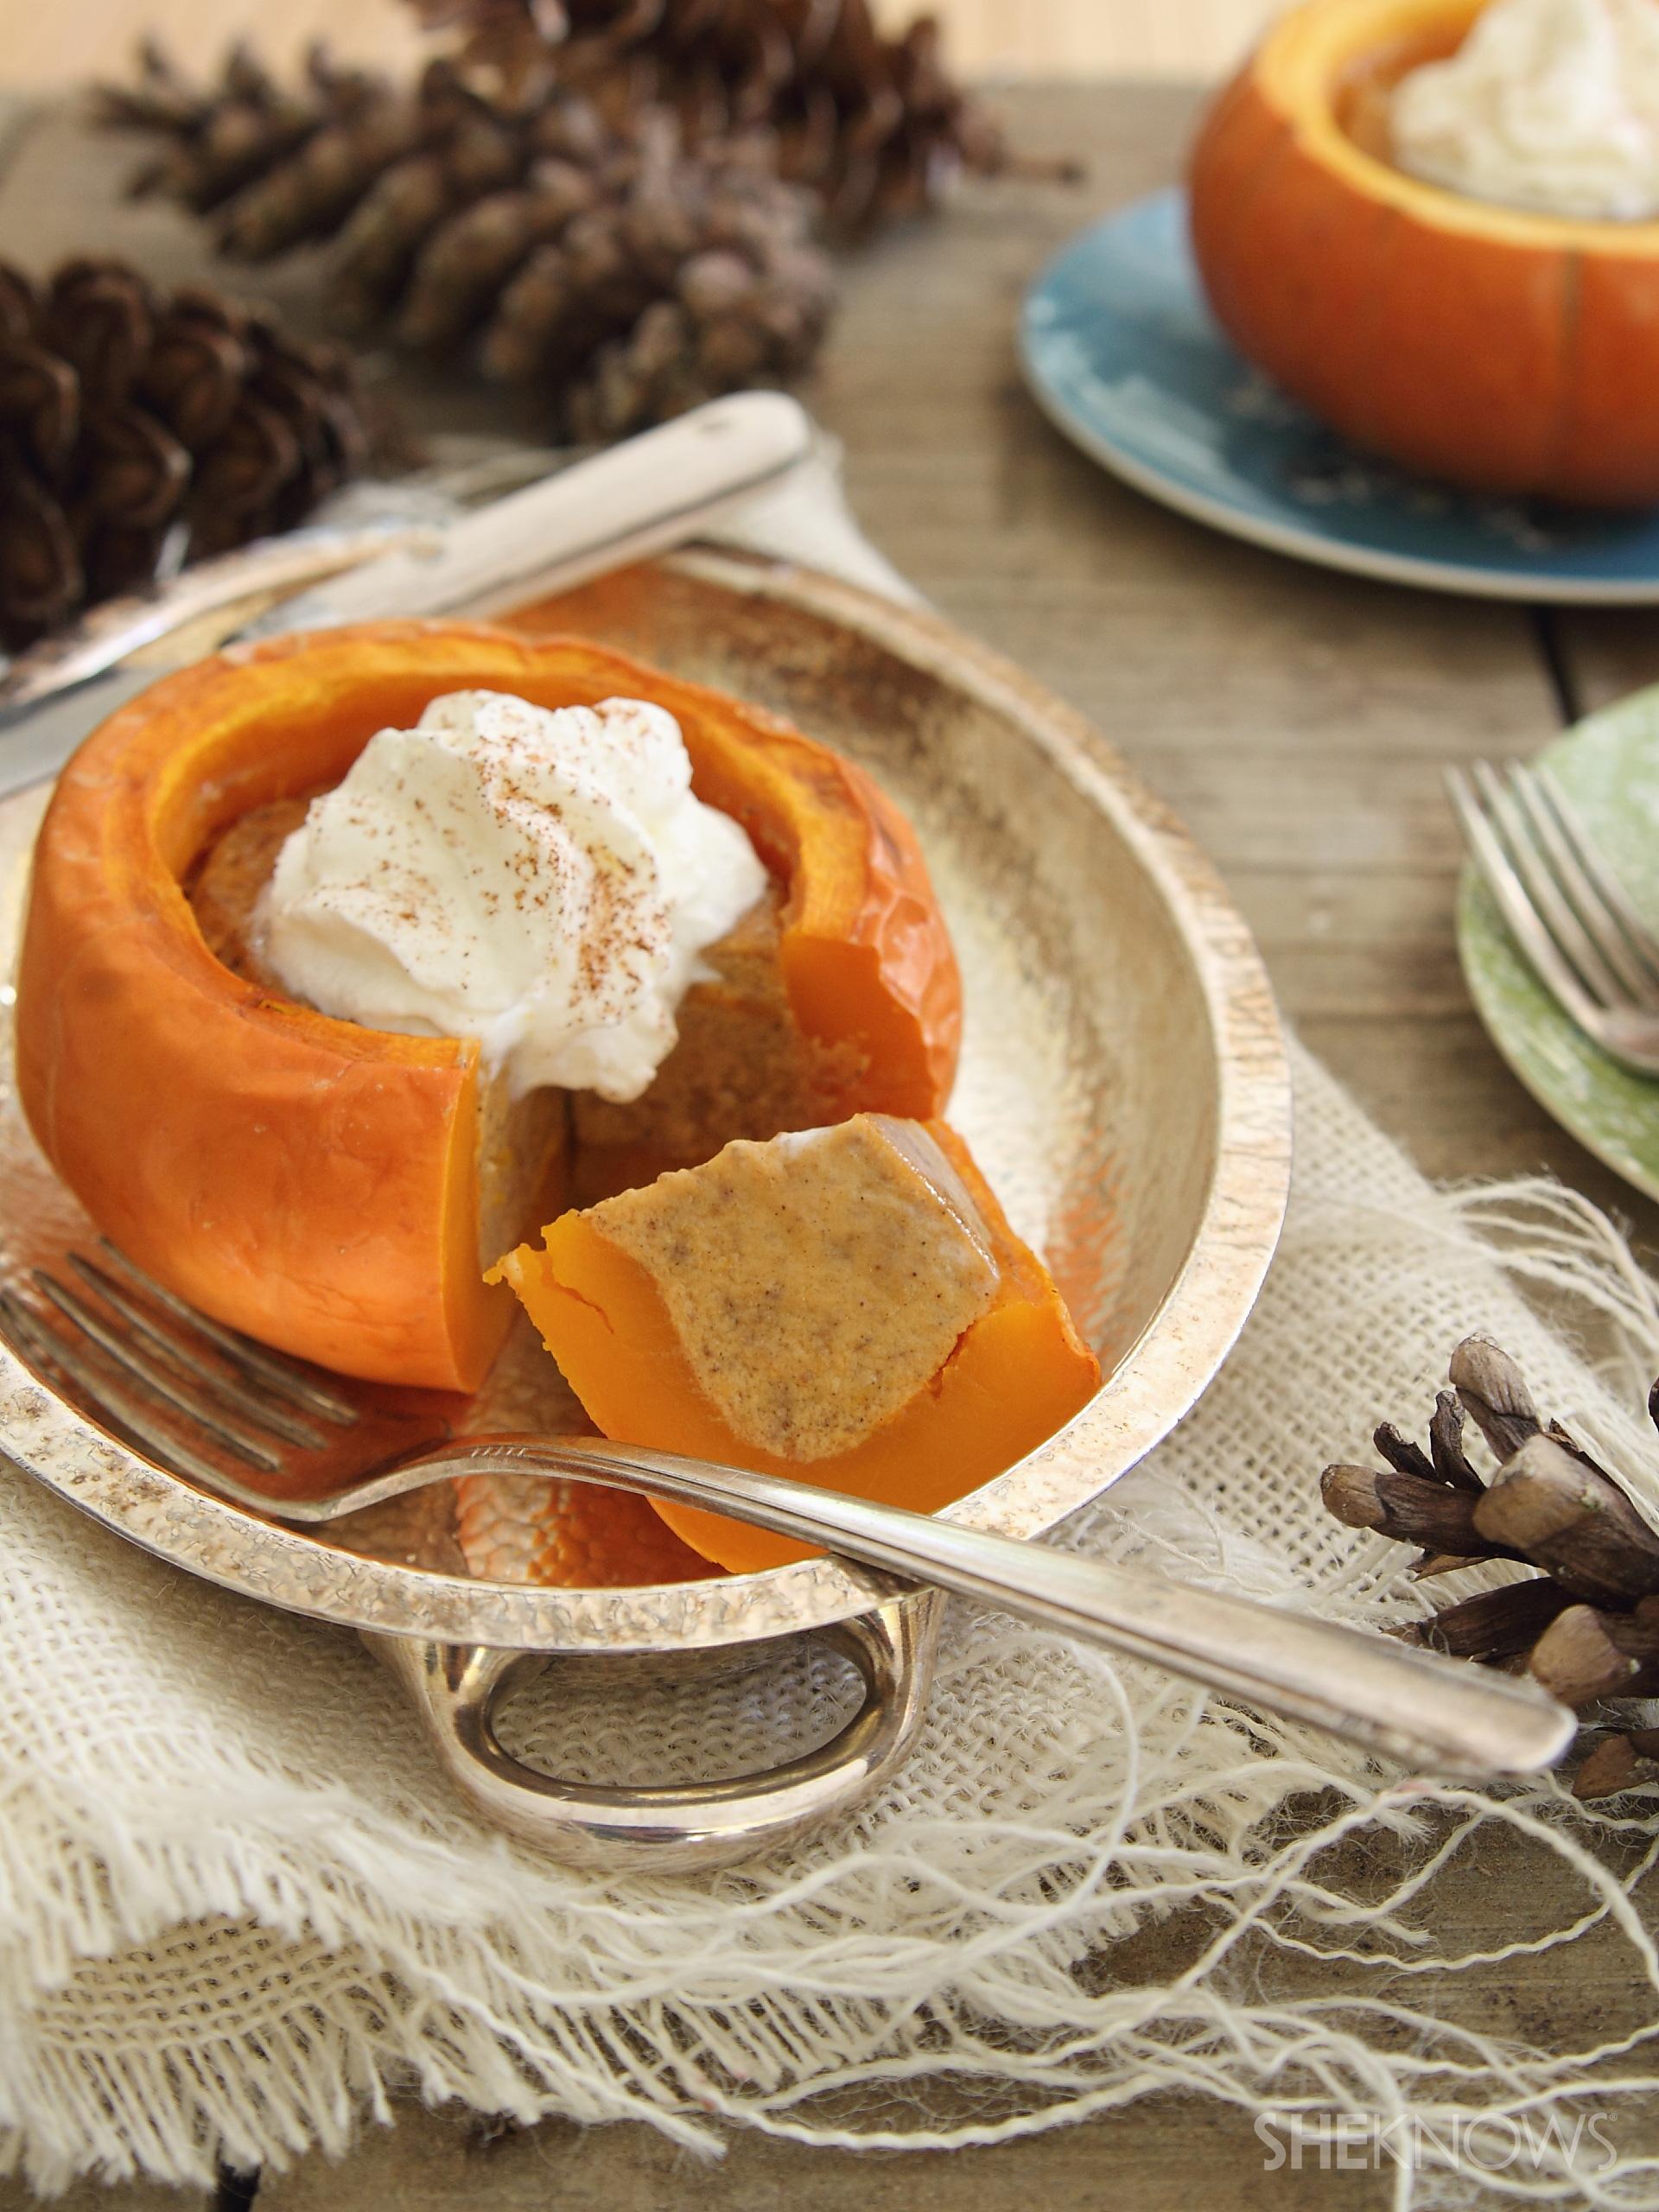 Pumpkin pie in a pumpkin